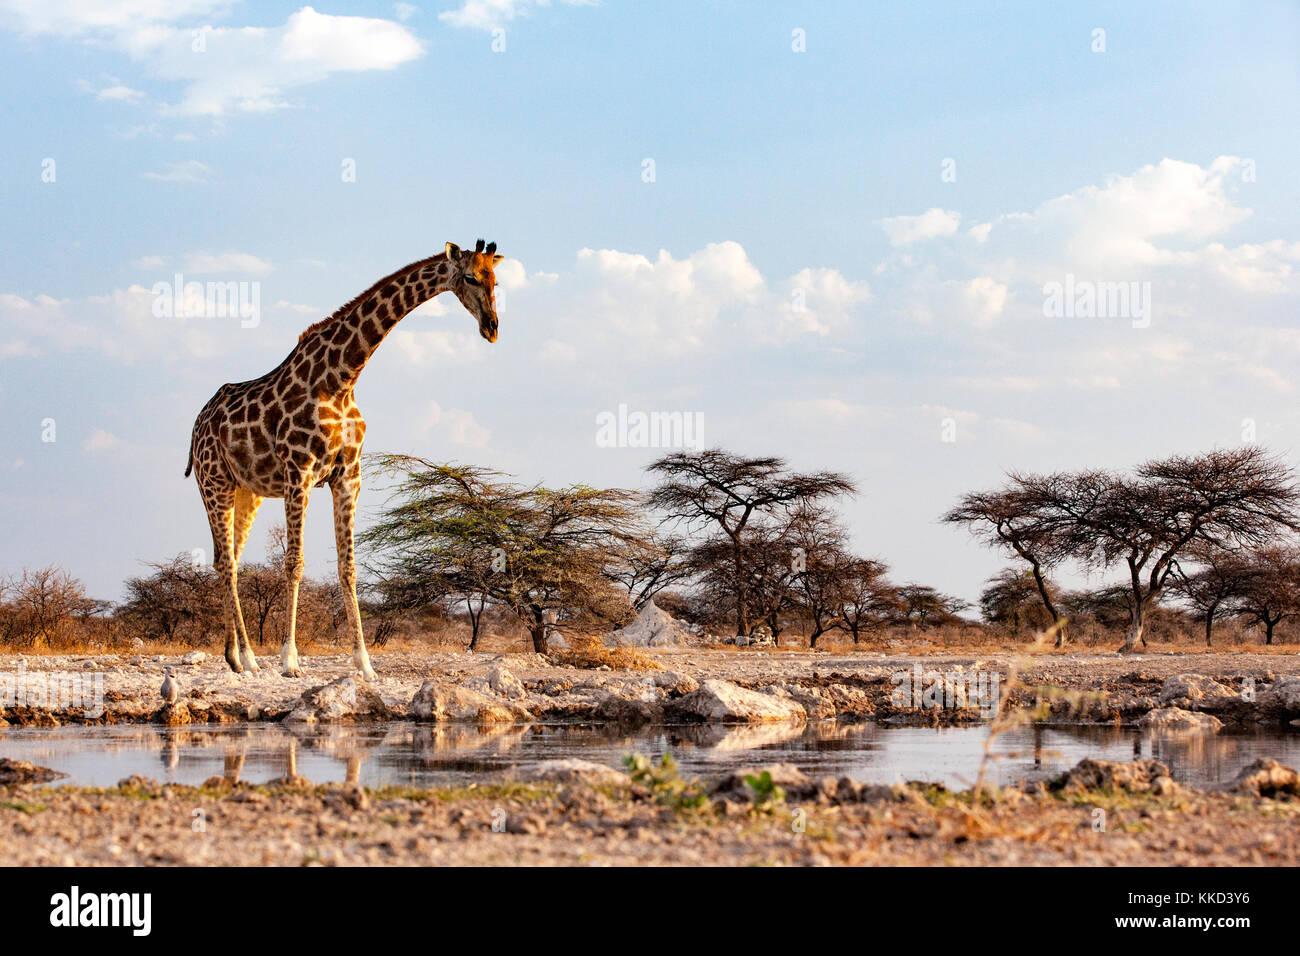 Giraffe at Onkolo Hide, Onguma Game Reserve, Namibia, Africa - Stock Image